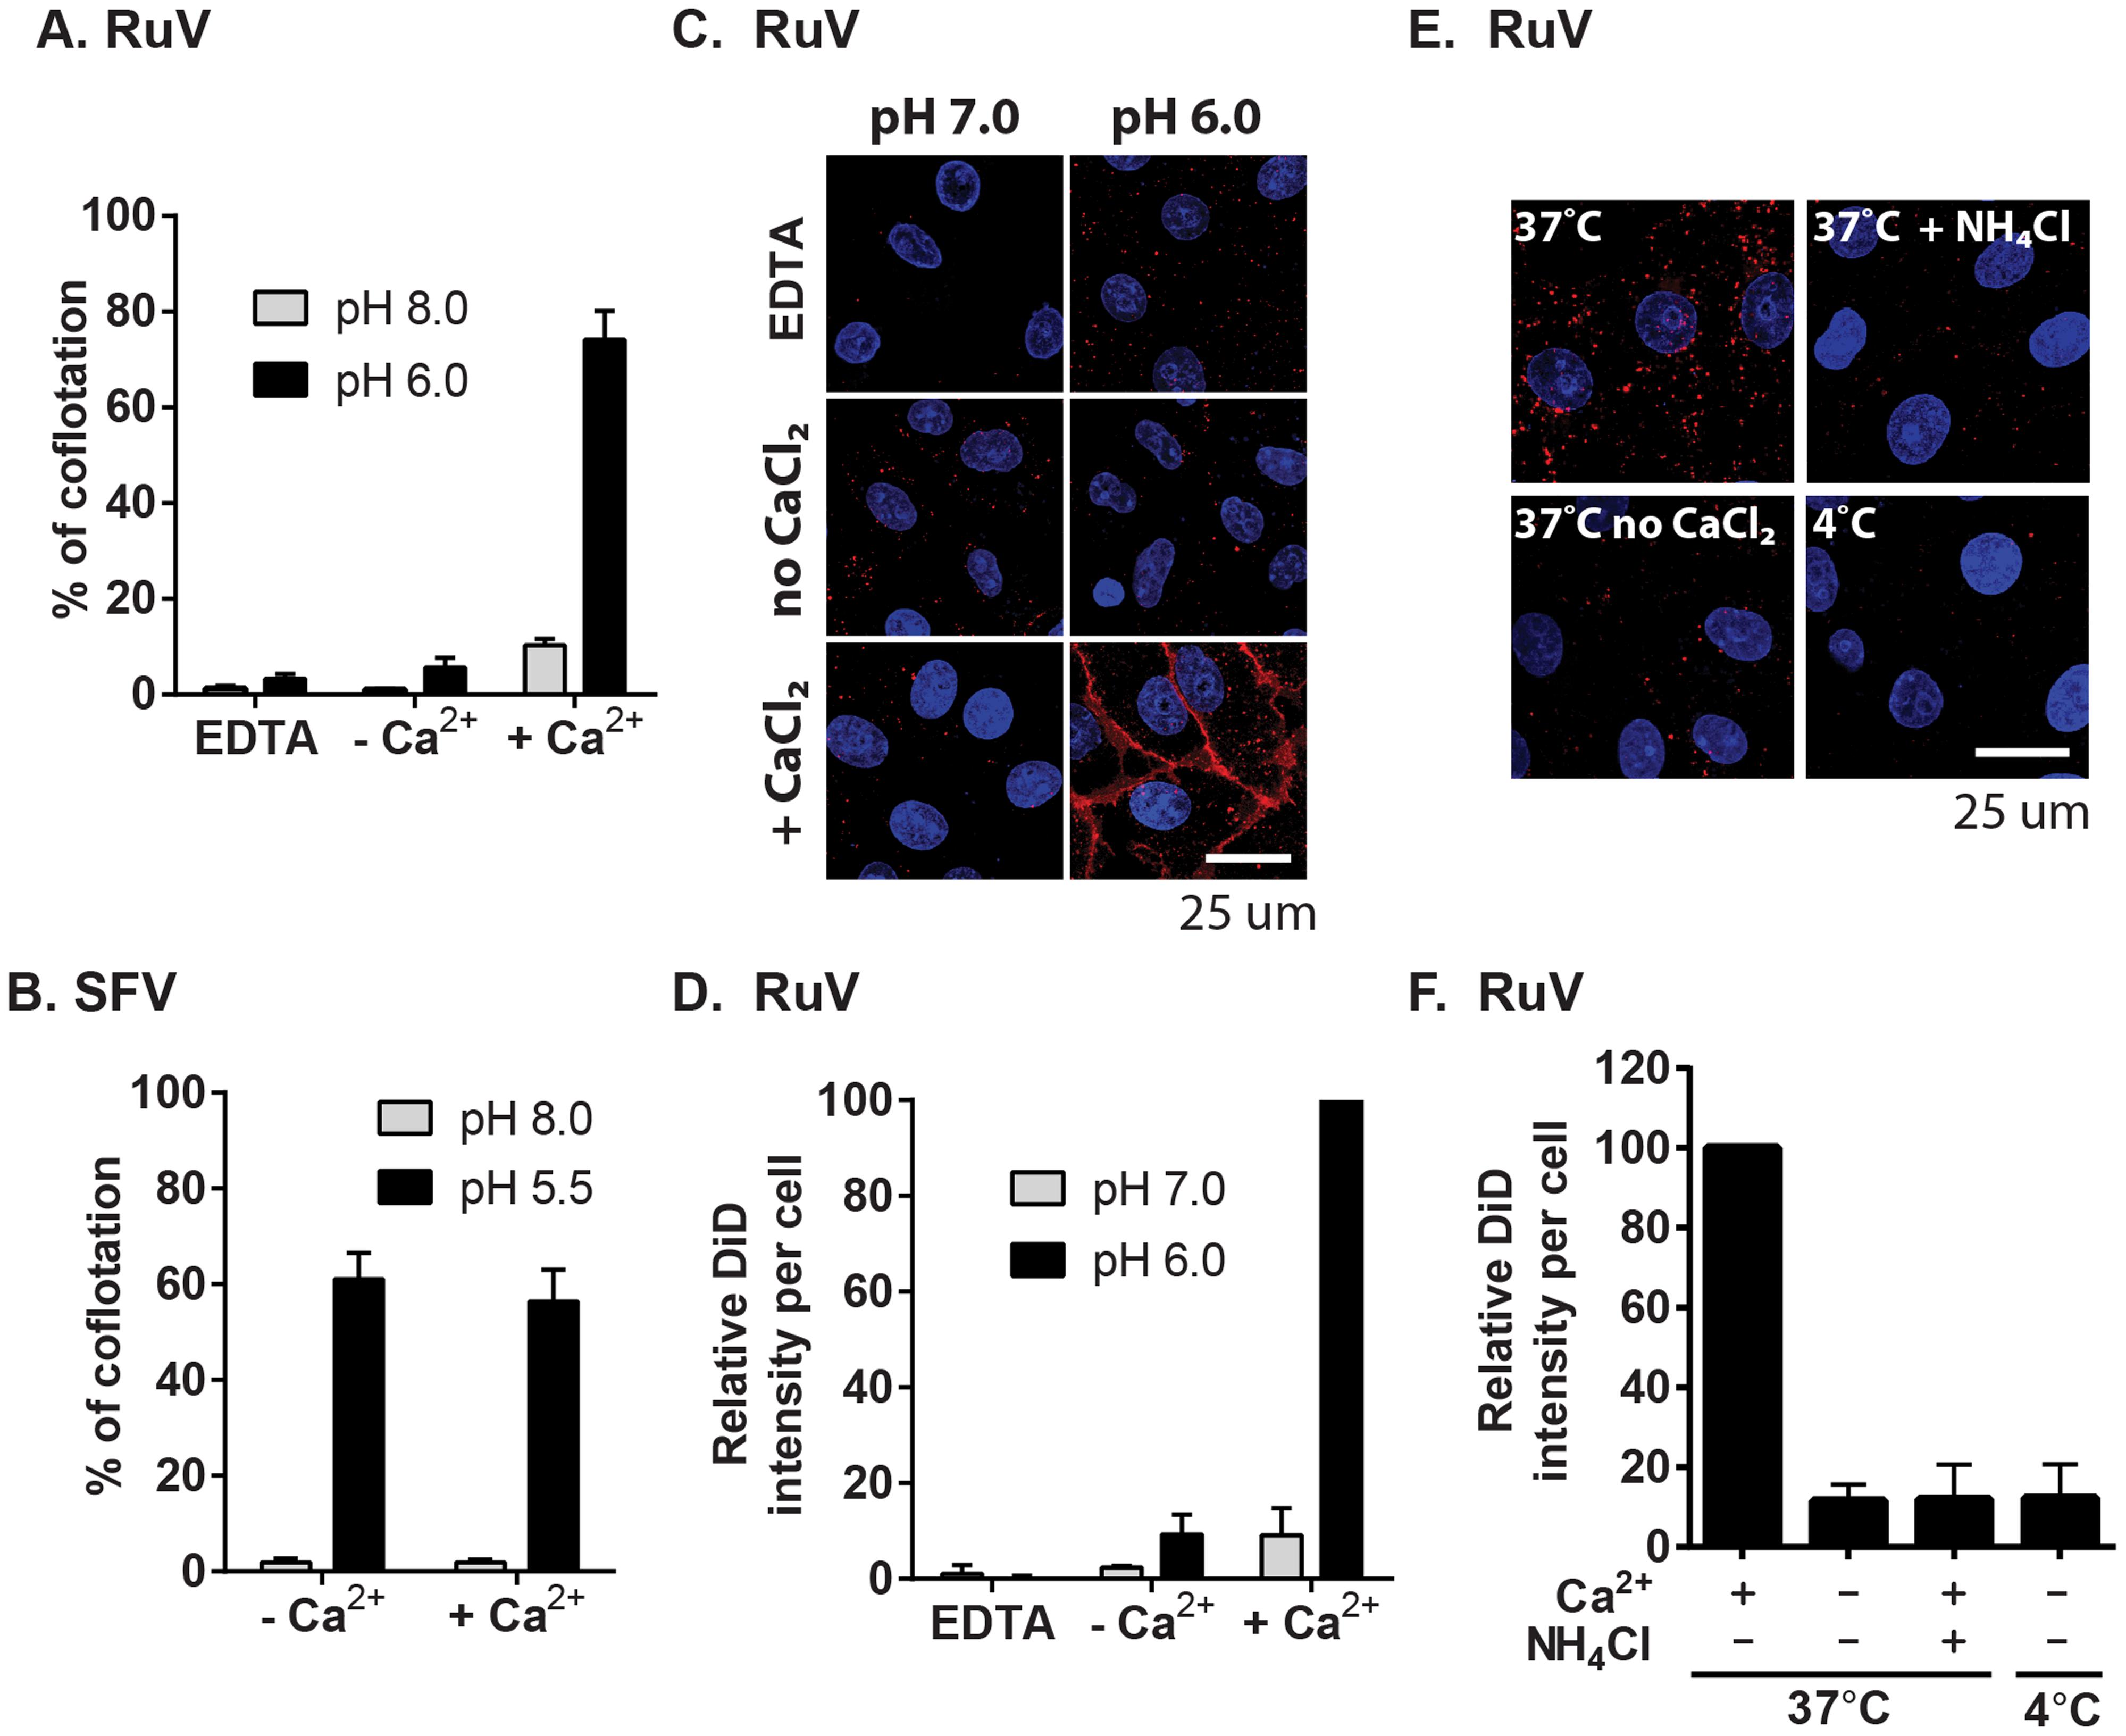 Calcium dependence of RuV-membrane interactions.